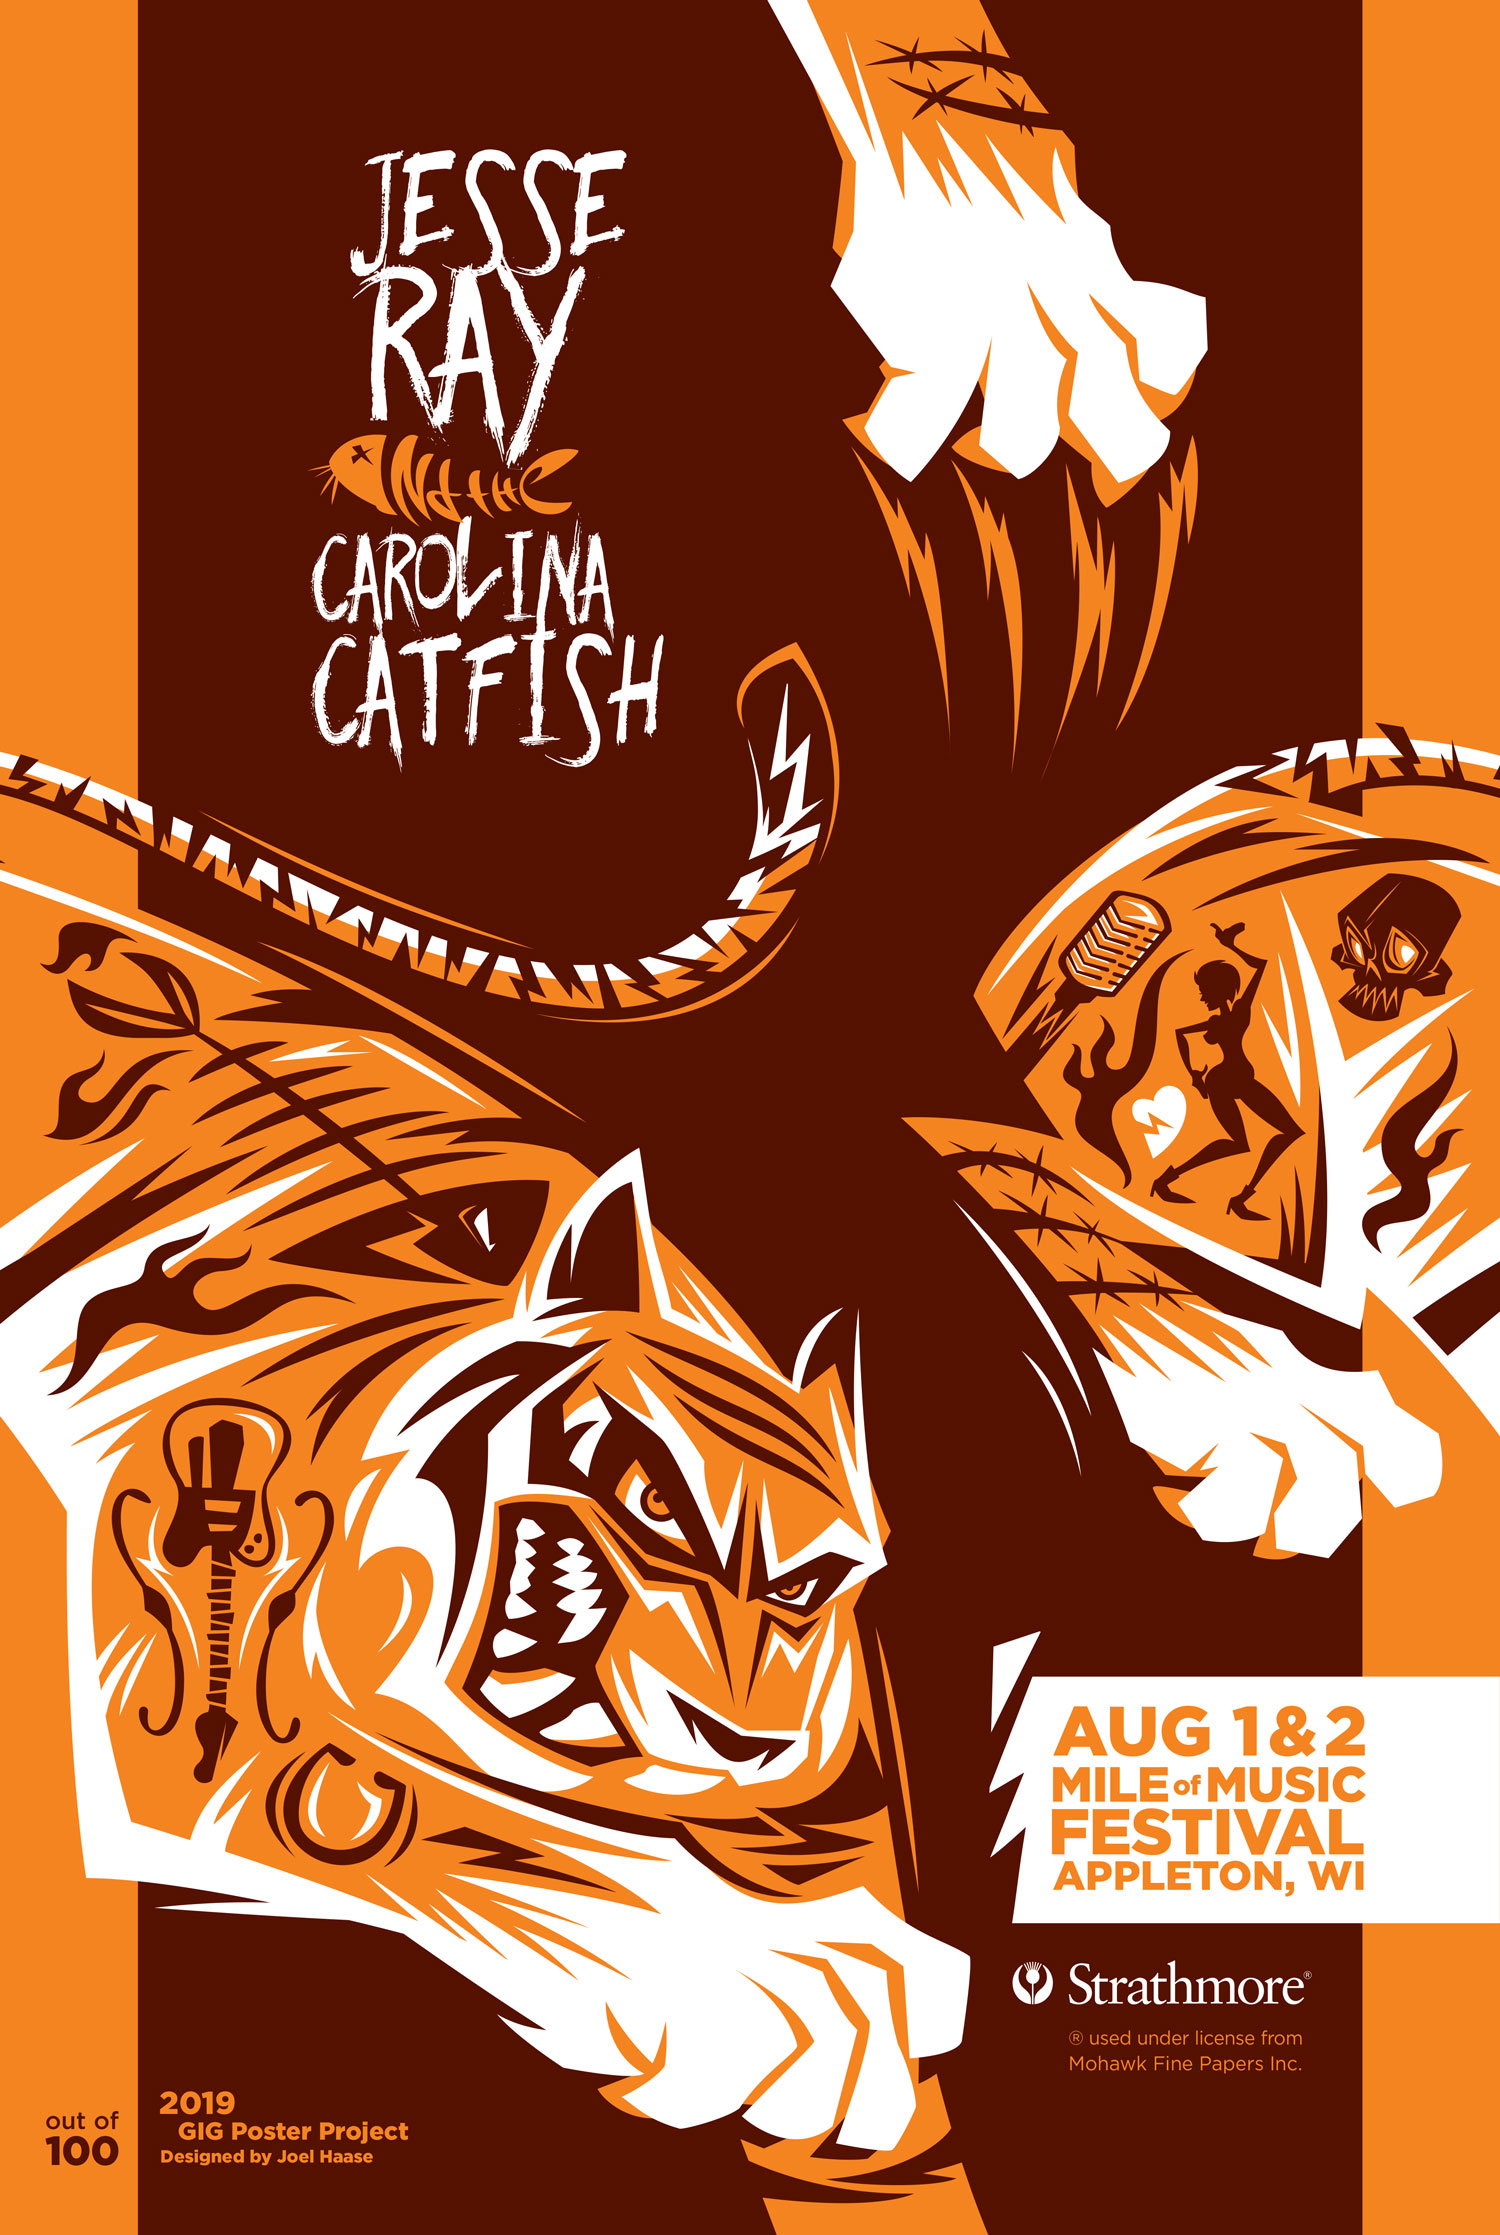 Jesse Ray & the Carolina Catfish